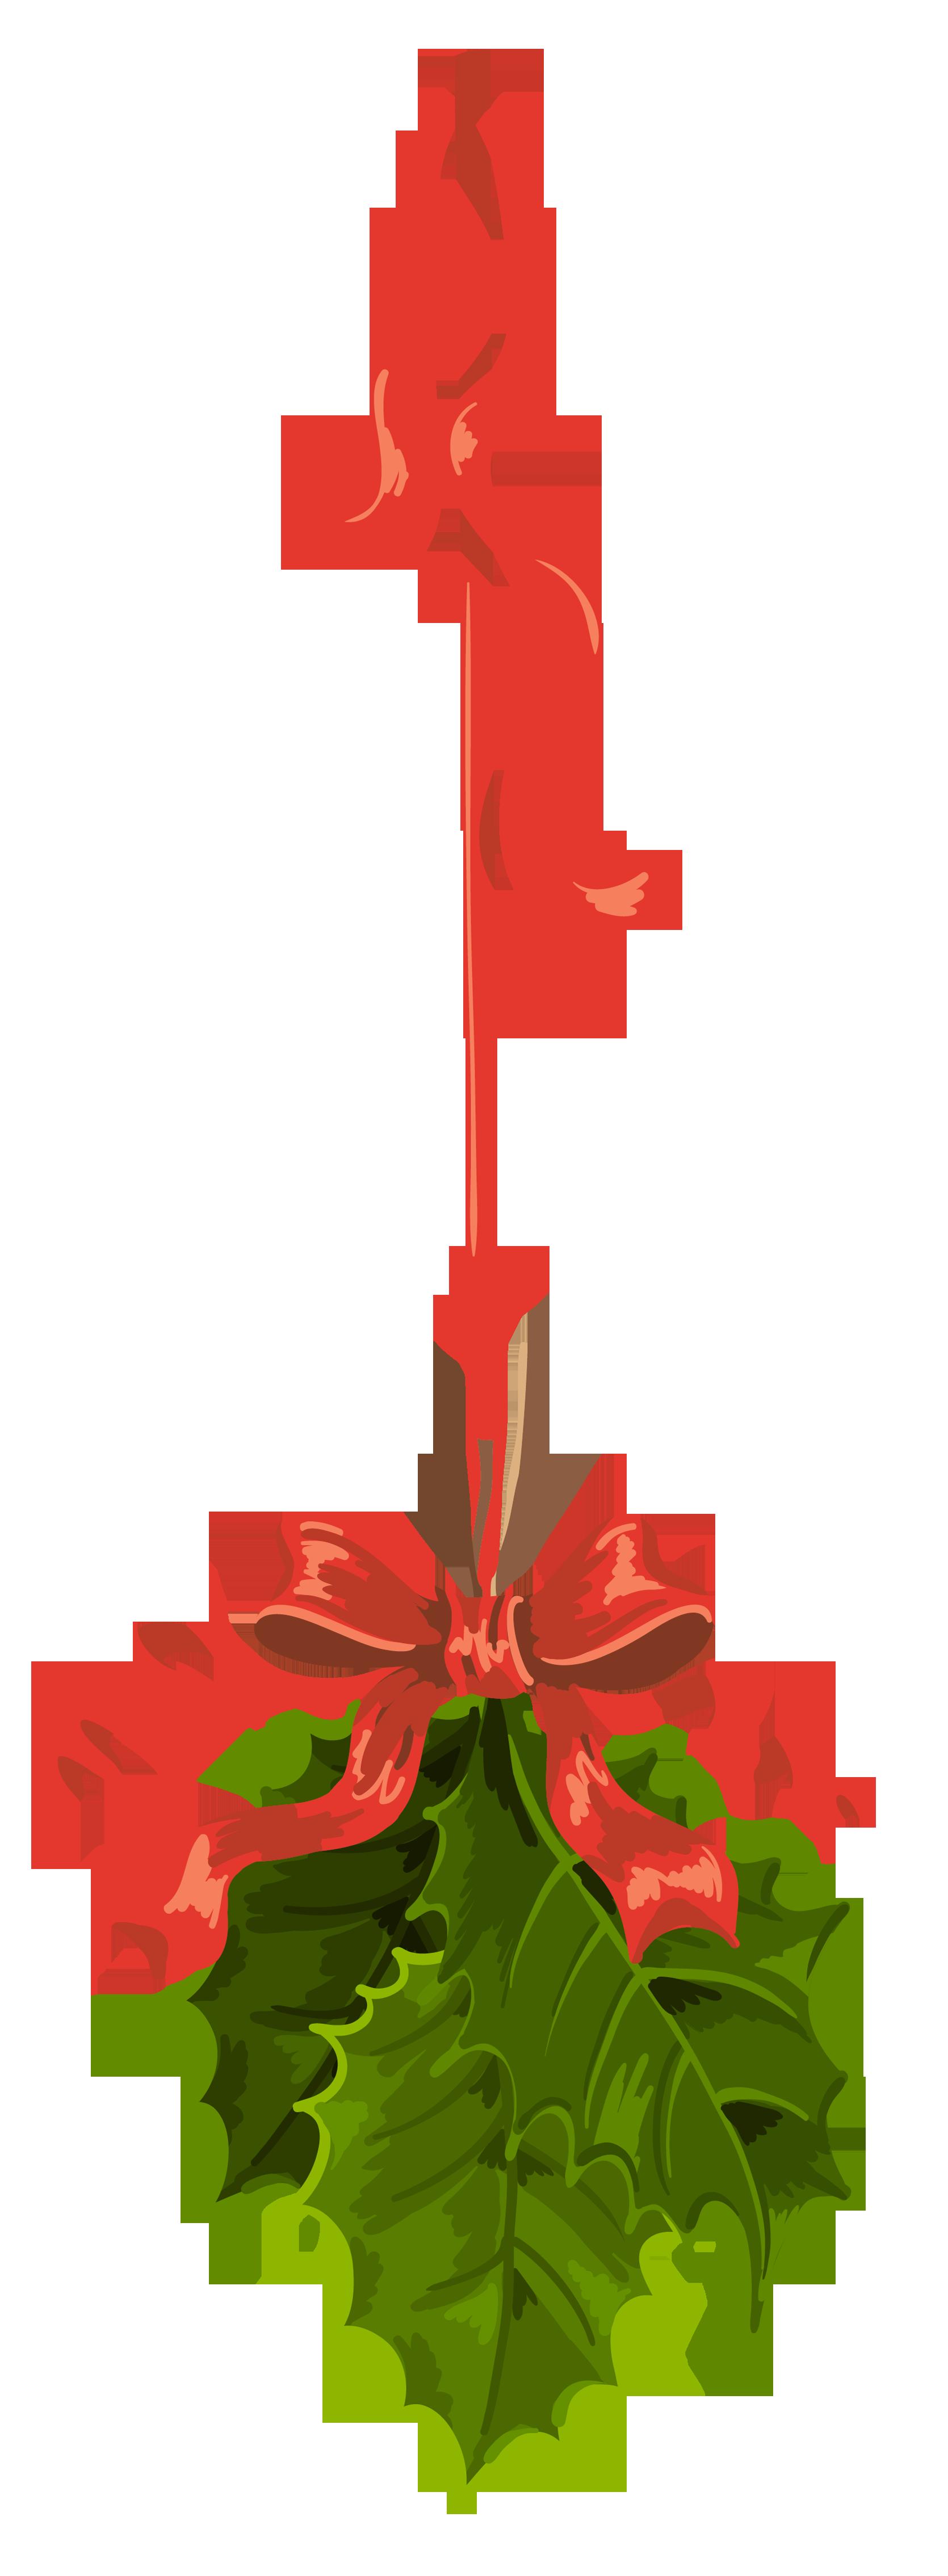 December clipart transparent. Image christmas hanging mistletoe